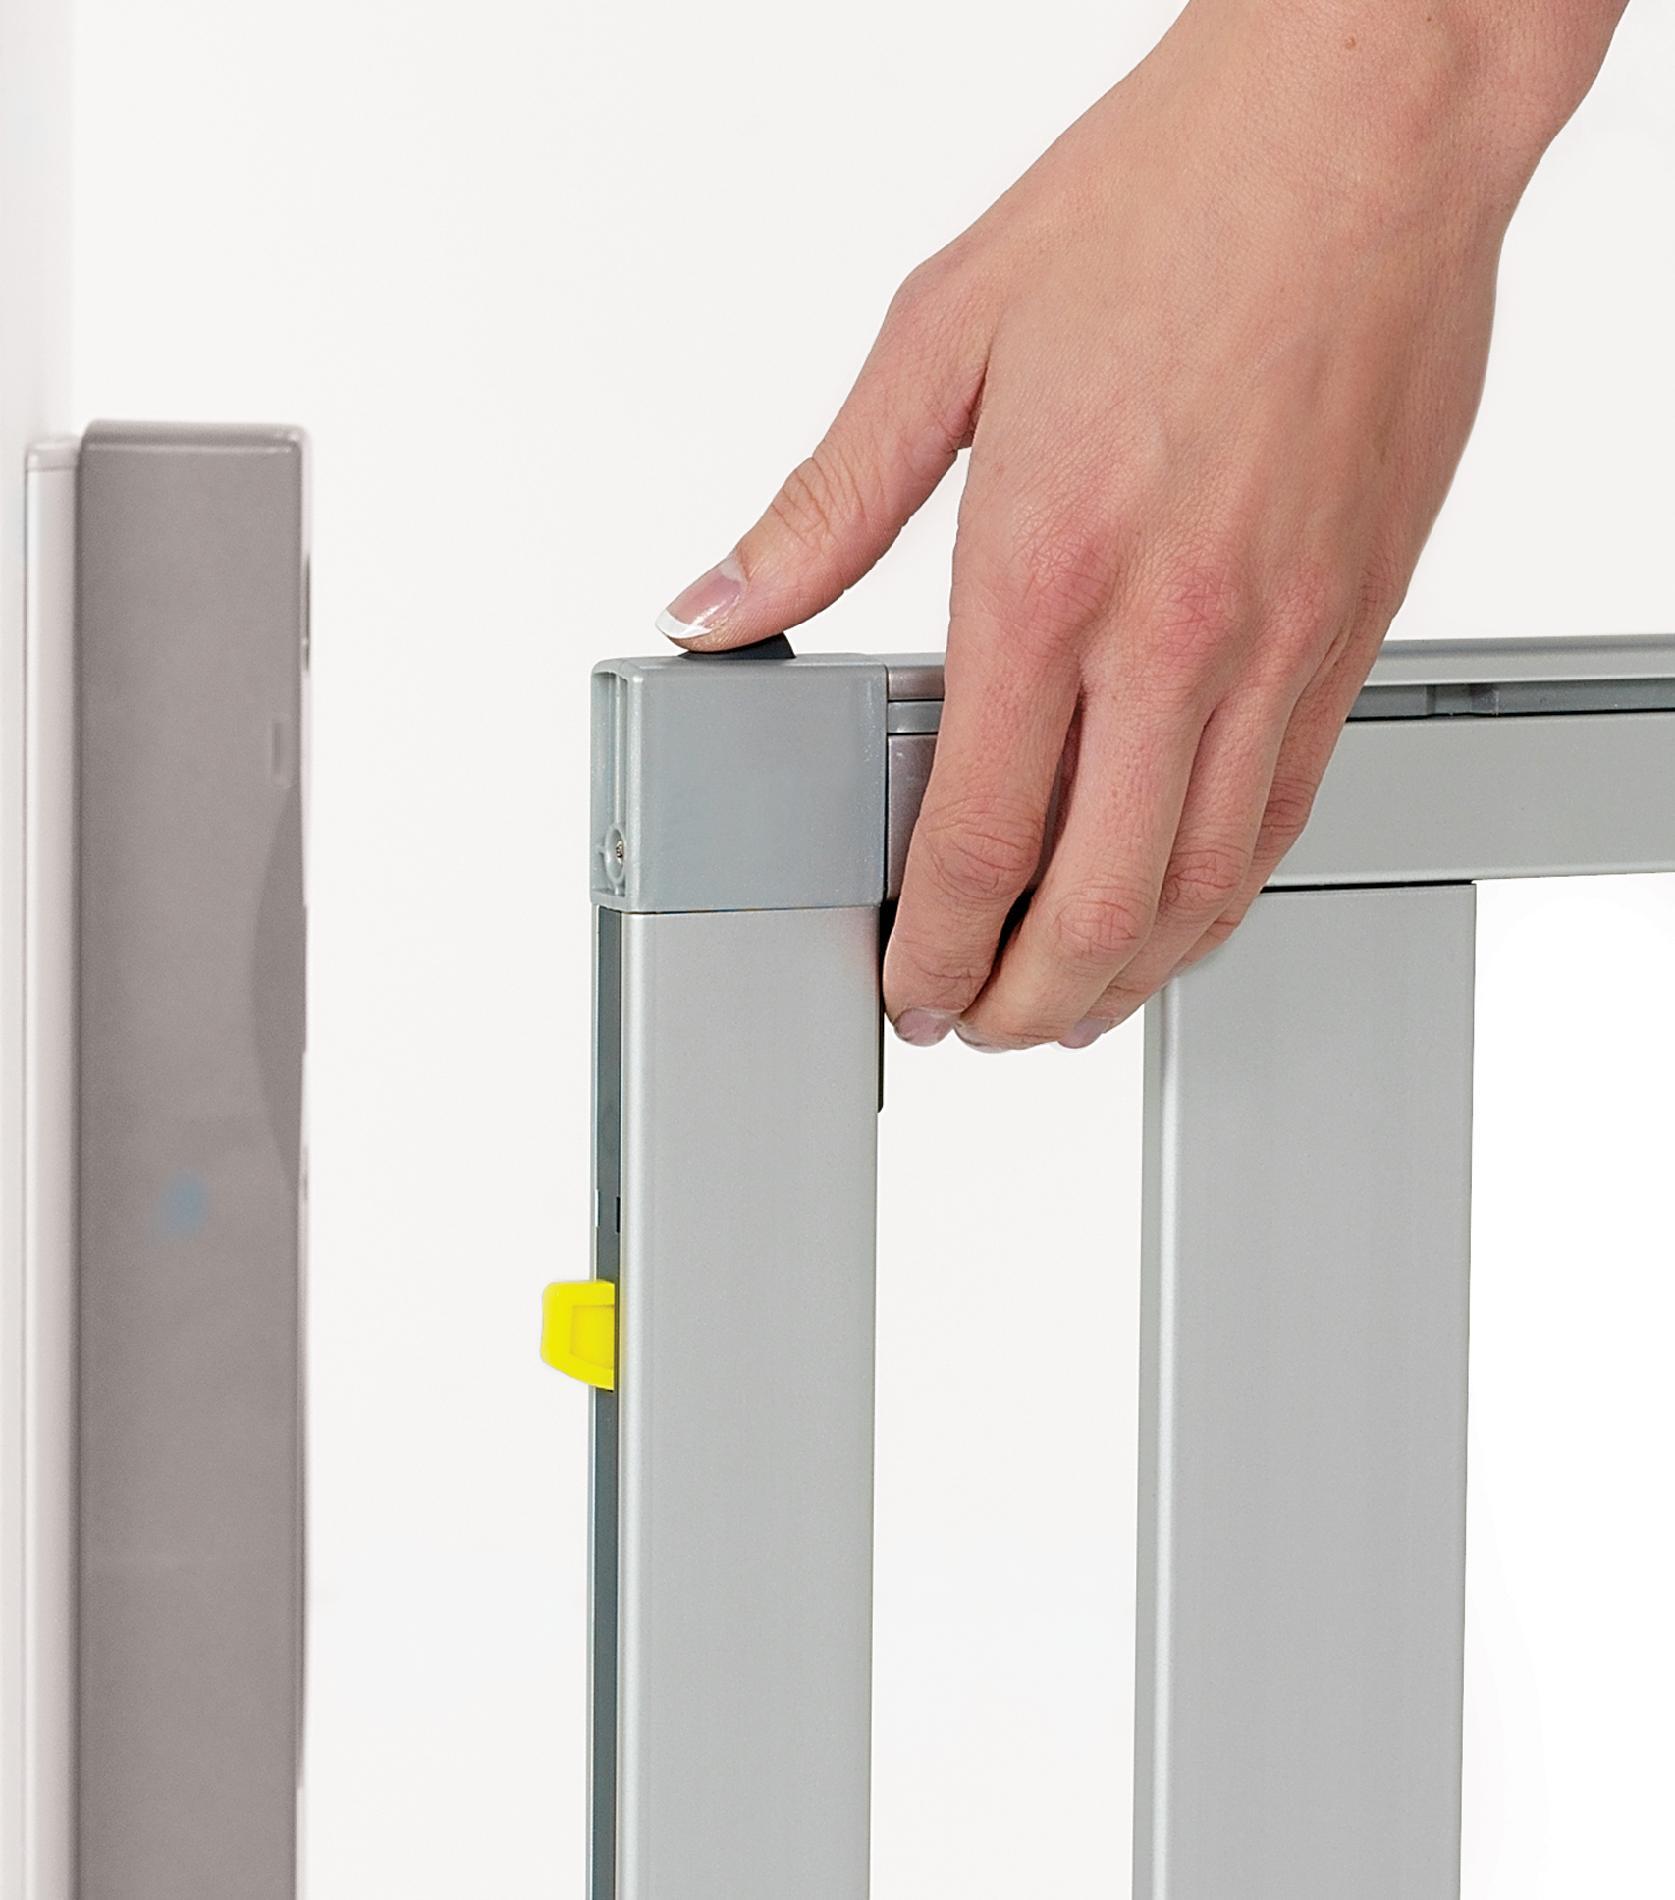 Munchkin 31064,31074 The Loft Gate - Aluminum